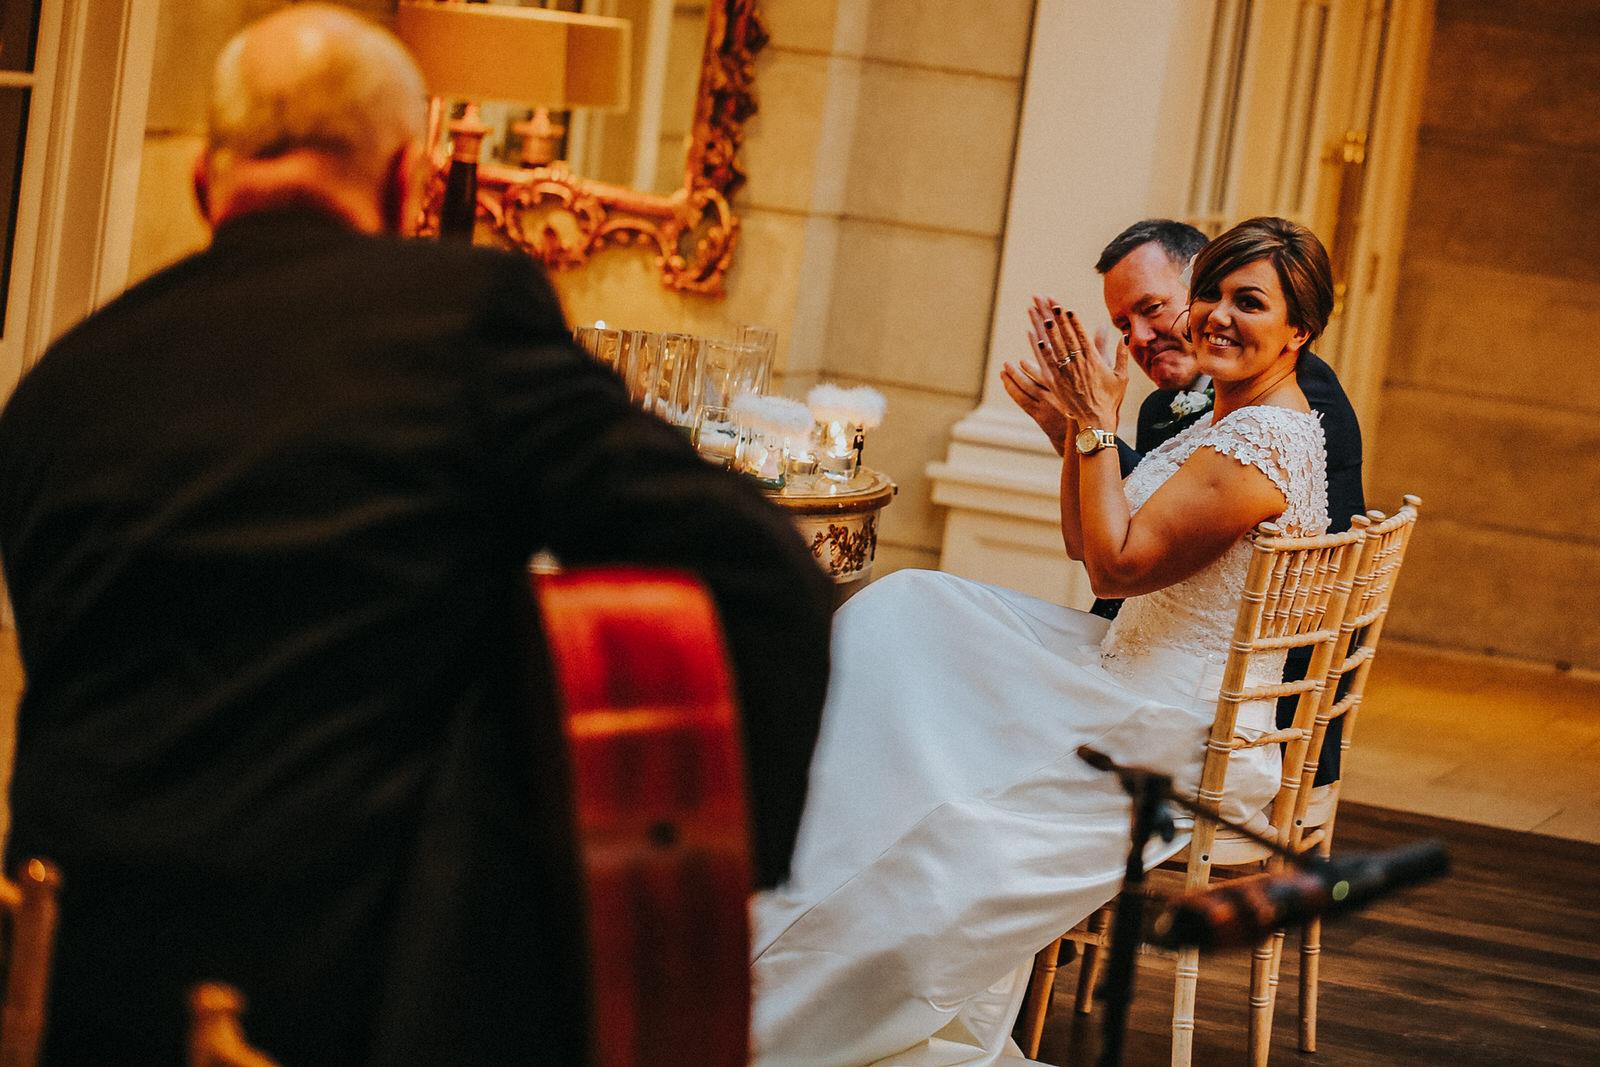 Roger_Kenny_wedding_photographer_Tankardstown_599.jpg